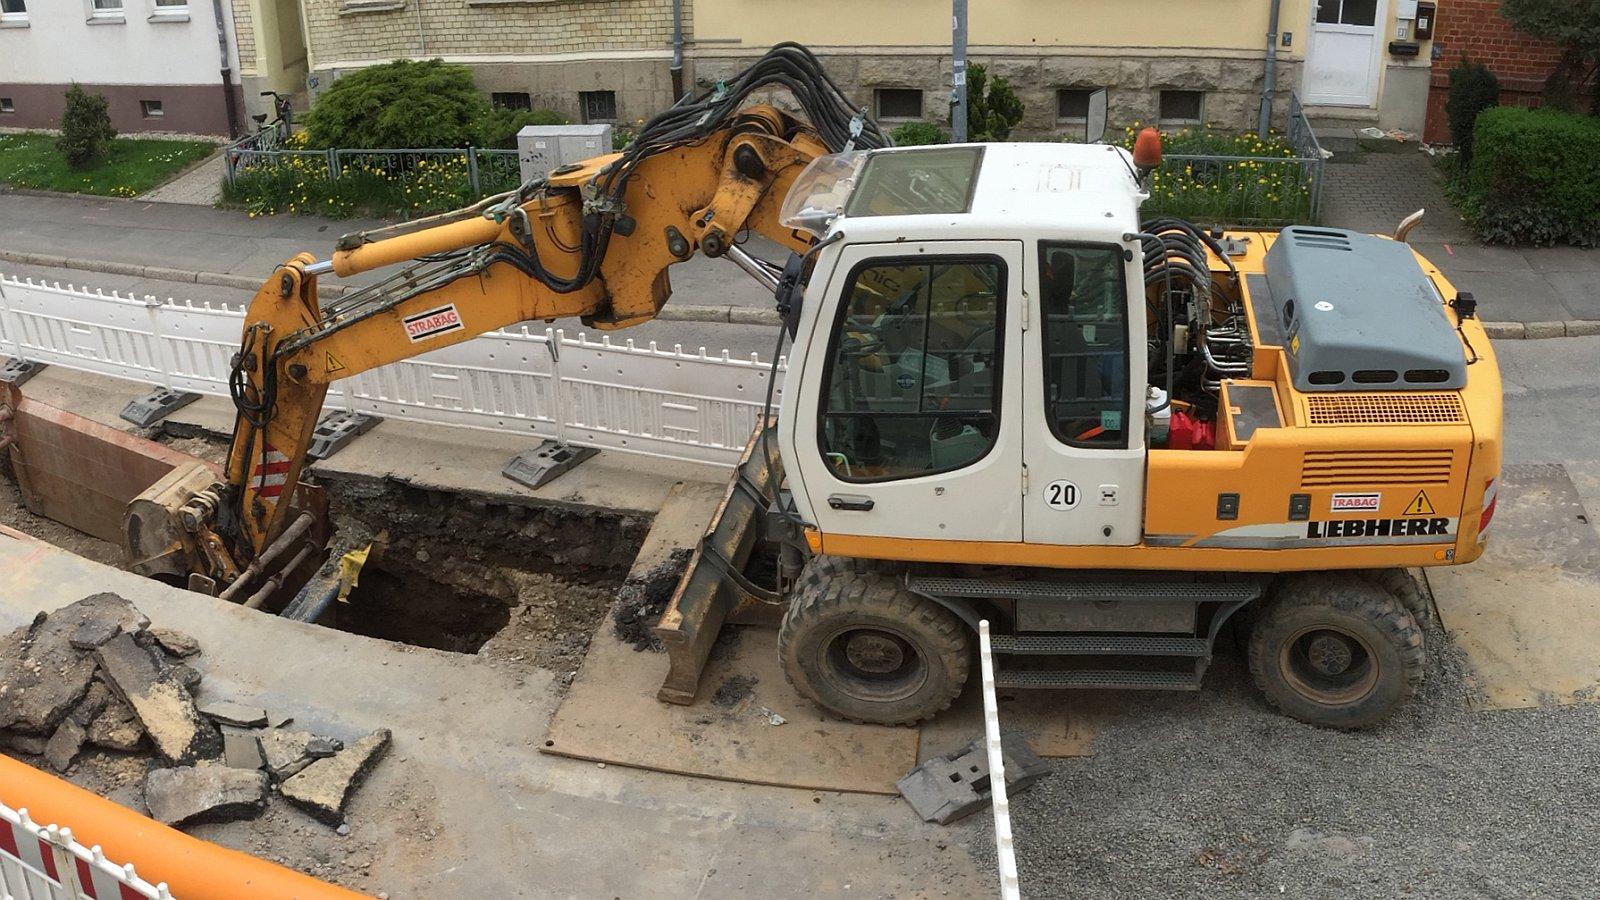 Straßenbauarbeiten mit Bagger